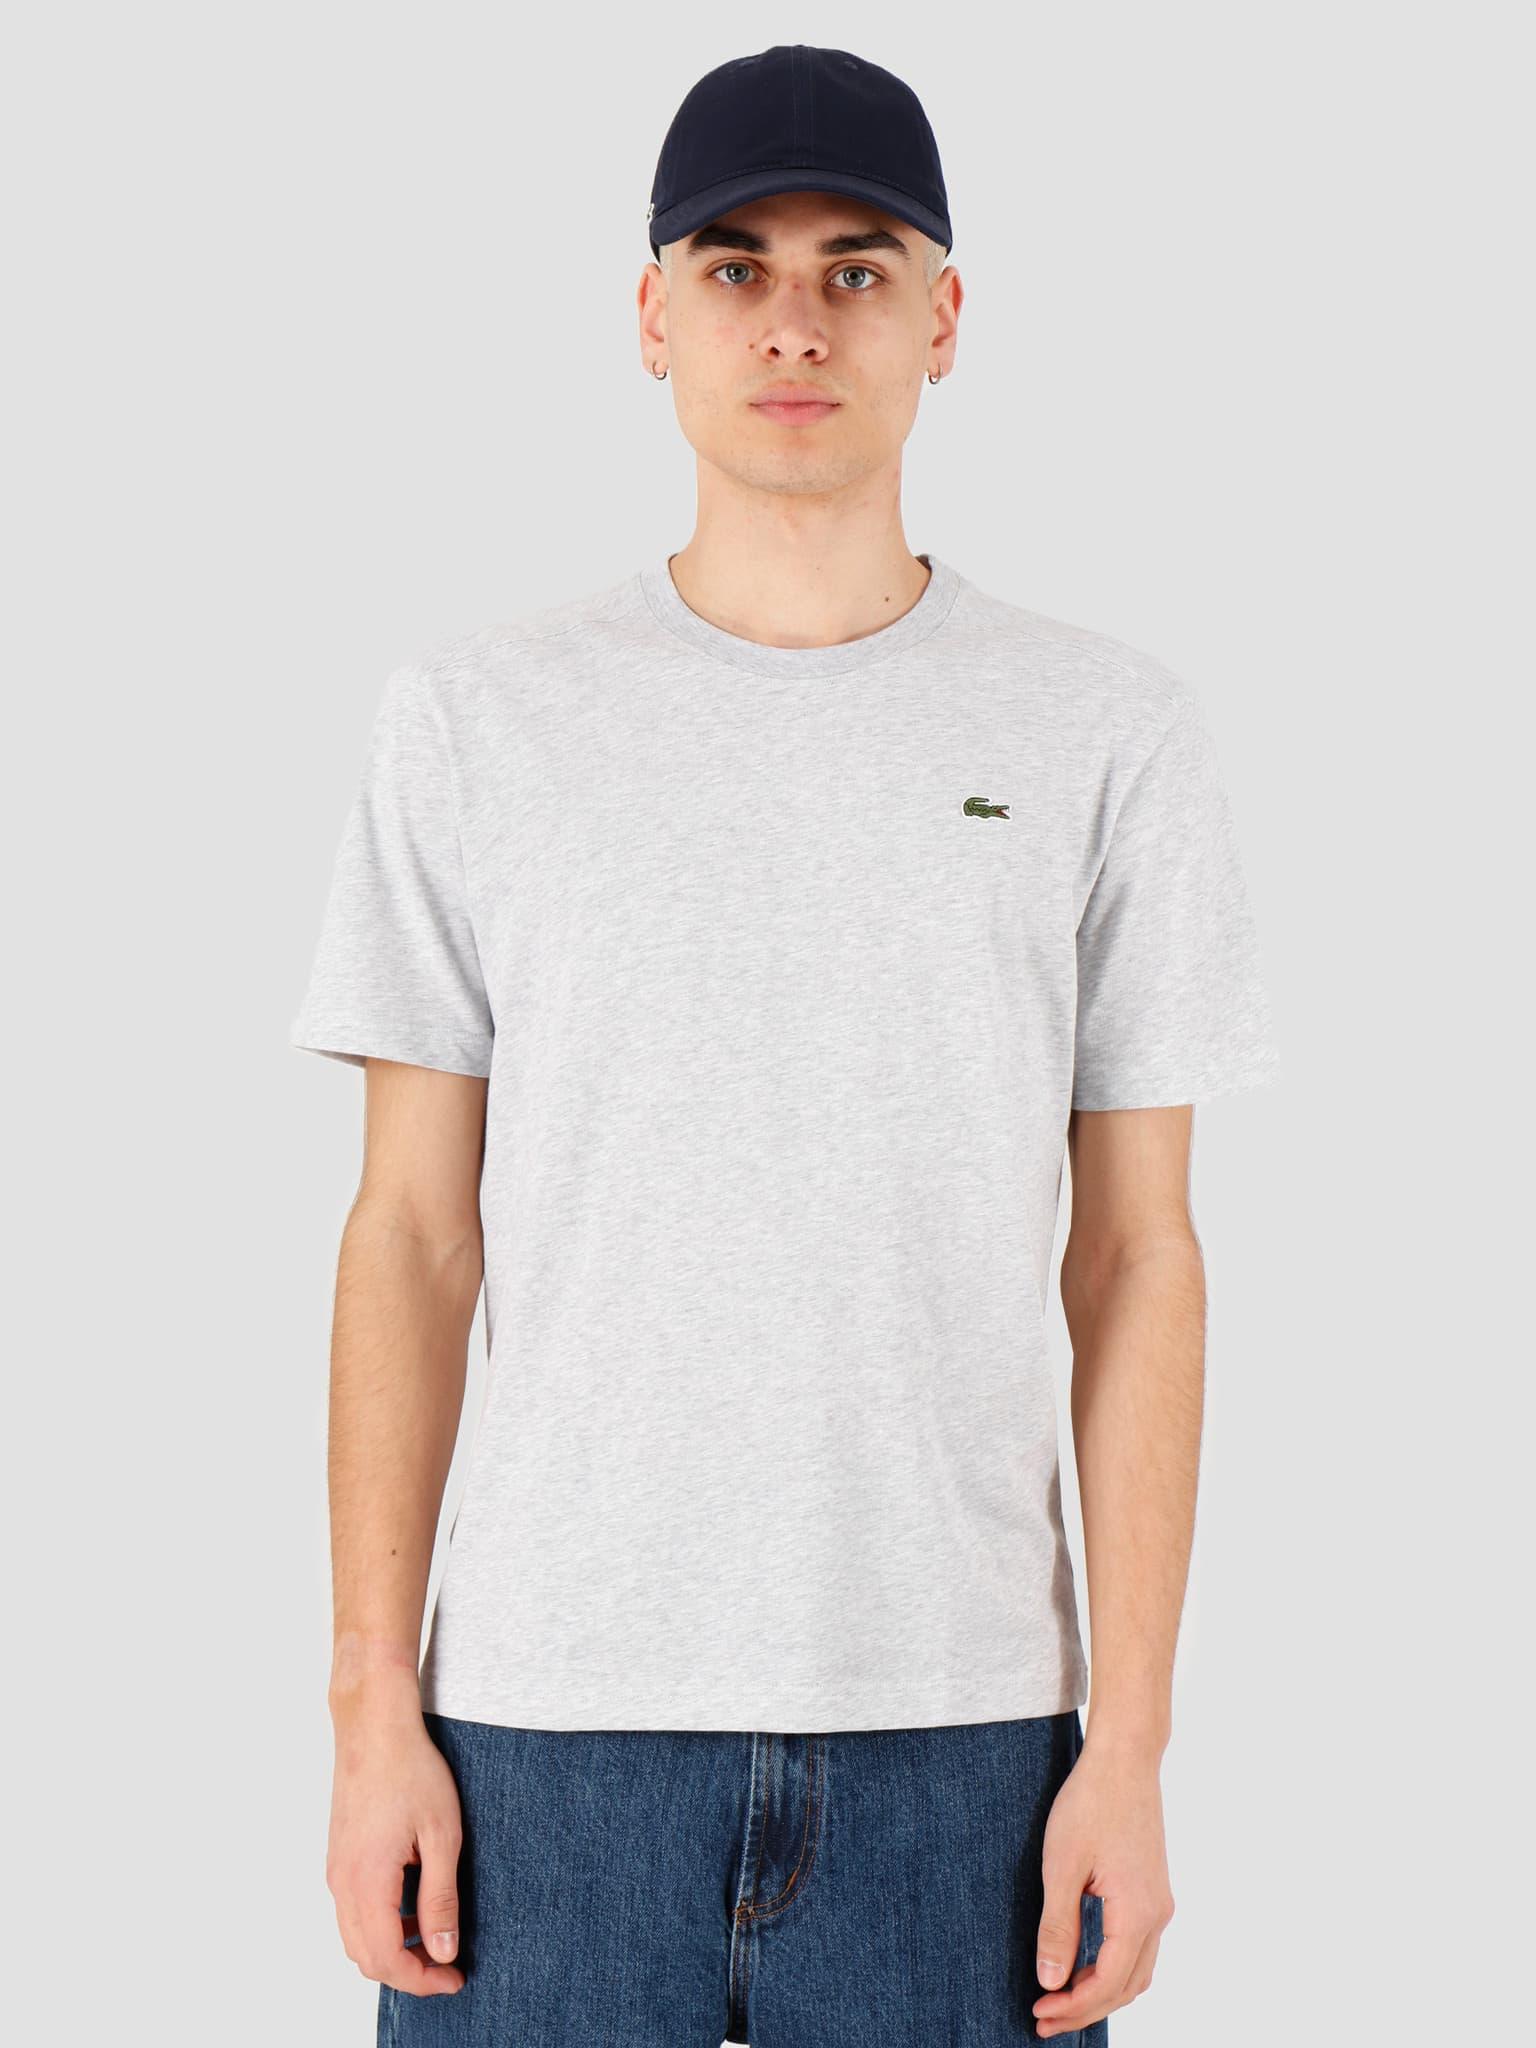 1HT1 T-Shirt Silver Chine TH7618-93